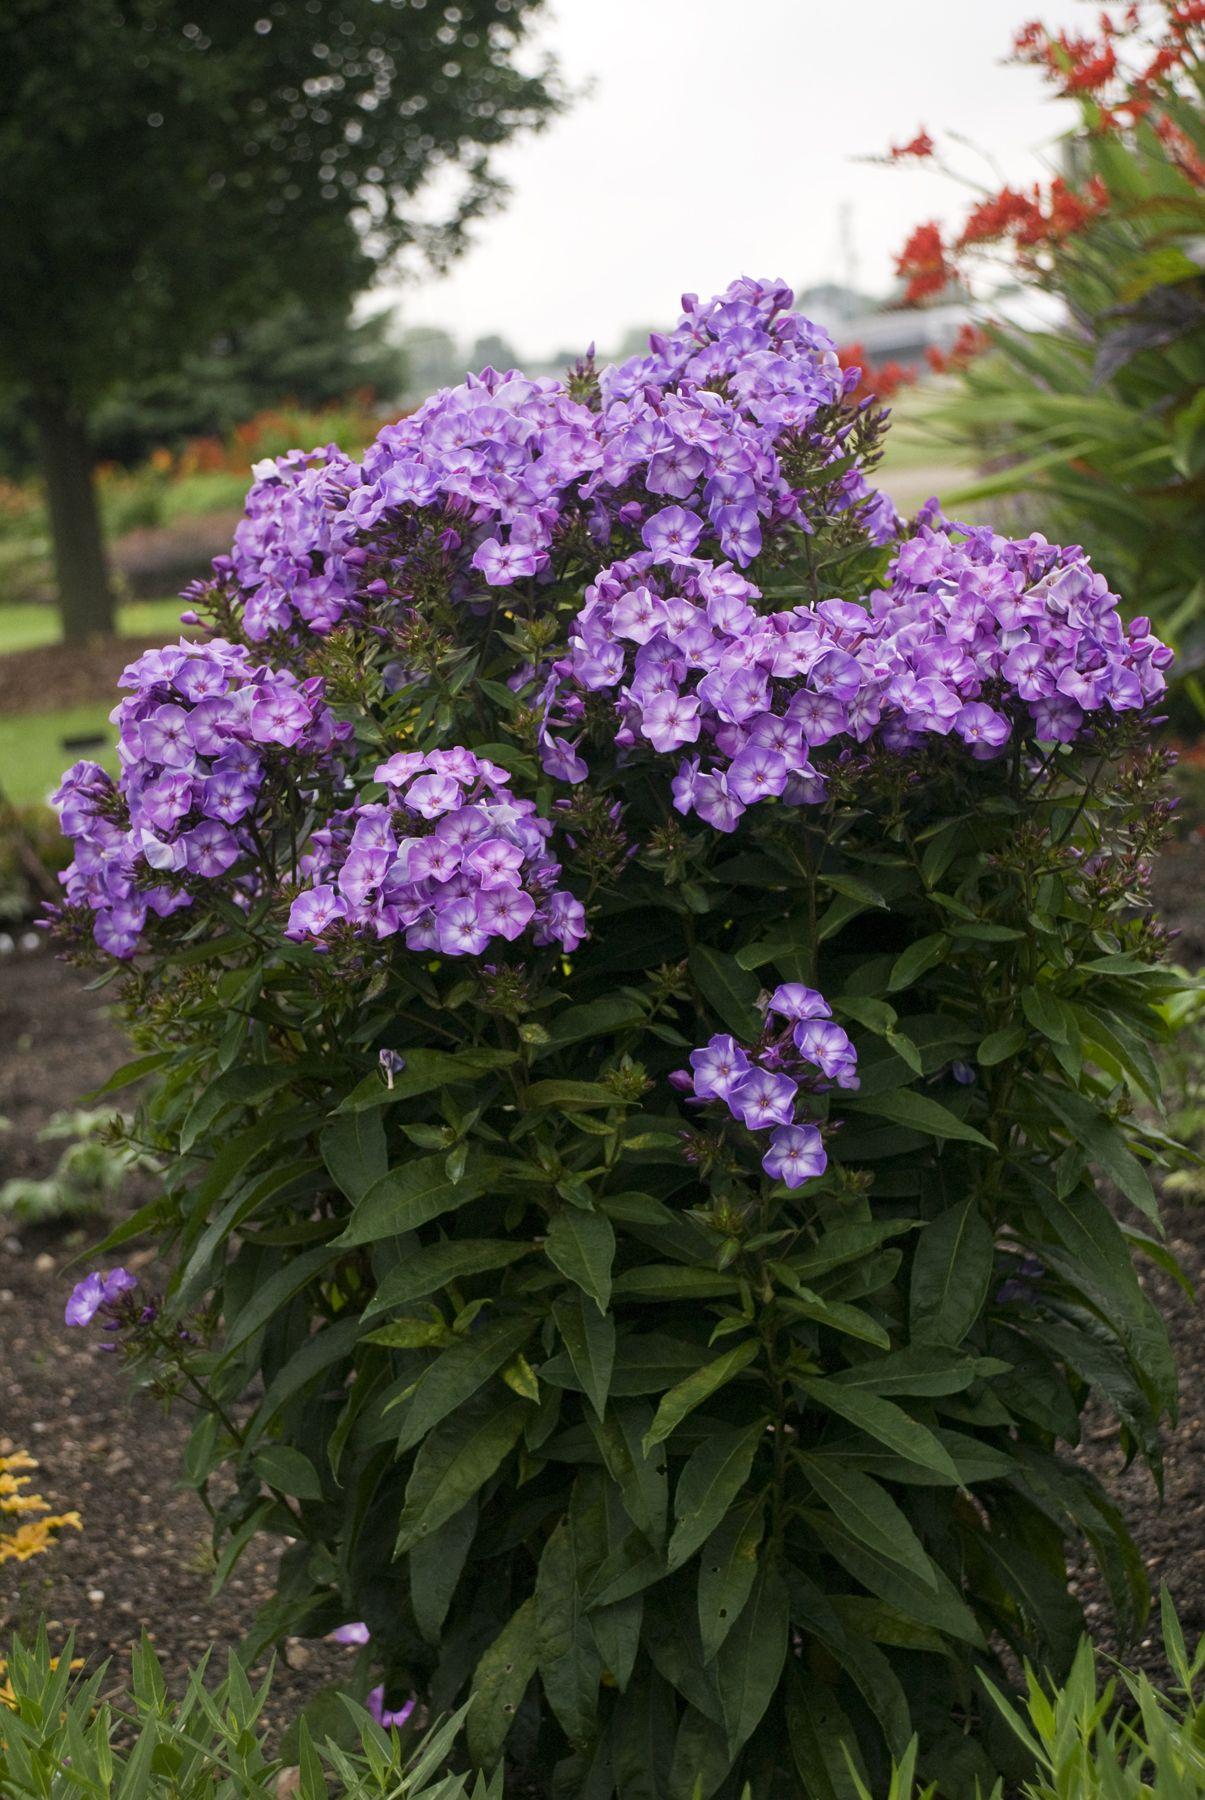 phlox pixie miracle grace blooms all summer zone 3 garden pinterest pixies gardening. Black Bedroom Furniture Sets. Home Design Ideas